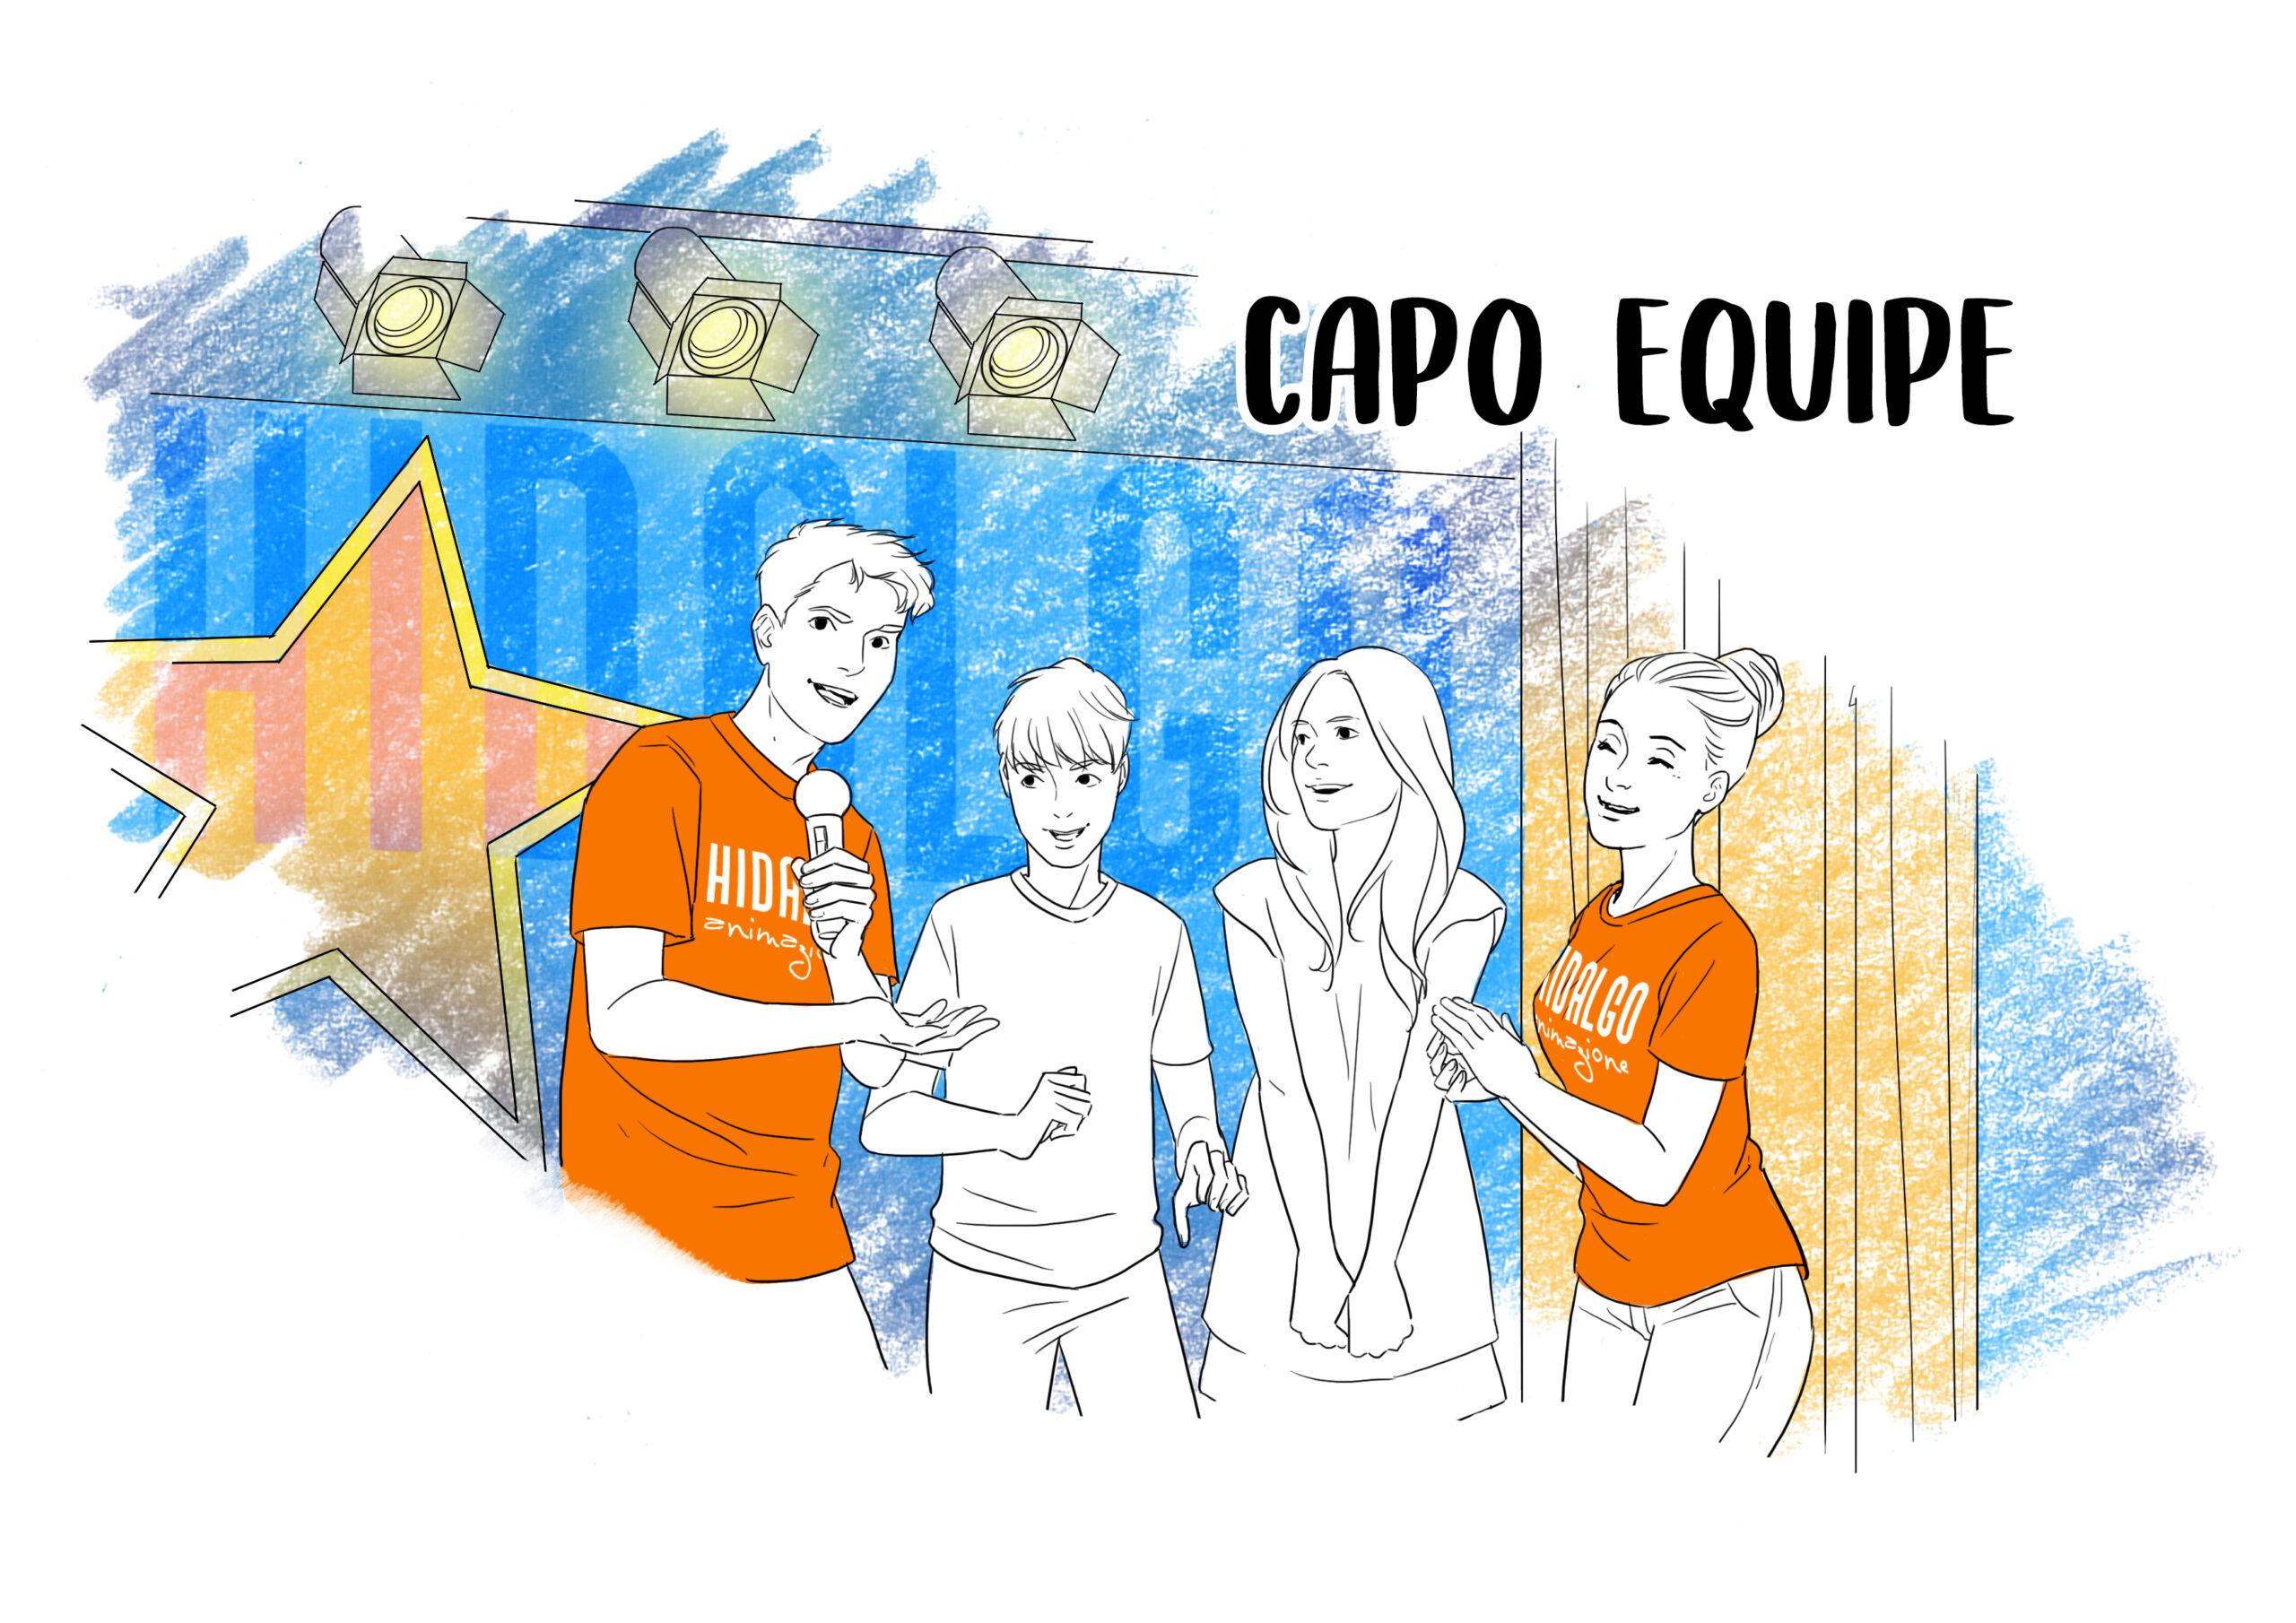 https://www.hidalgoanimazione.it/wp-content/uploads/2020/04/capo-equipe-scaled.jpg